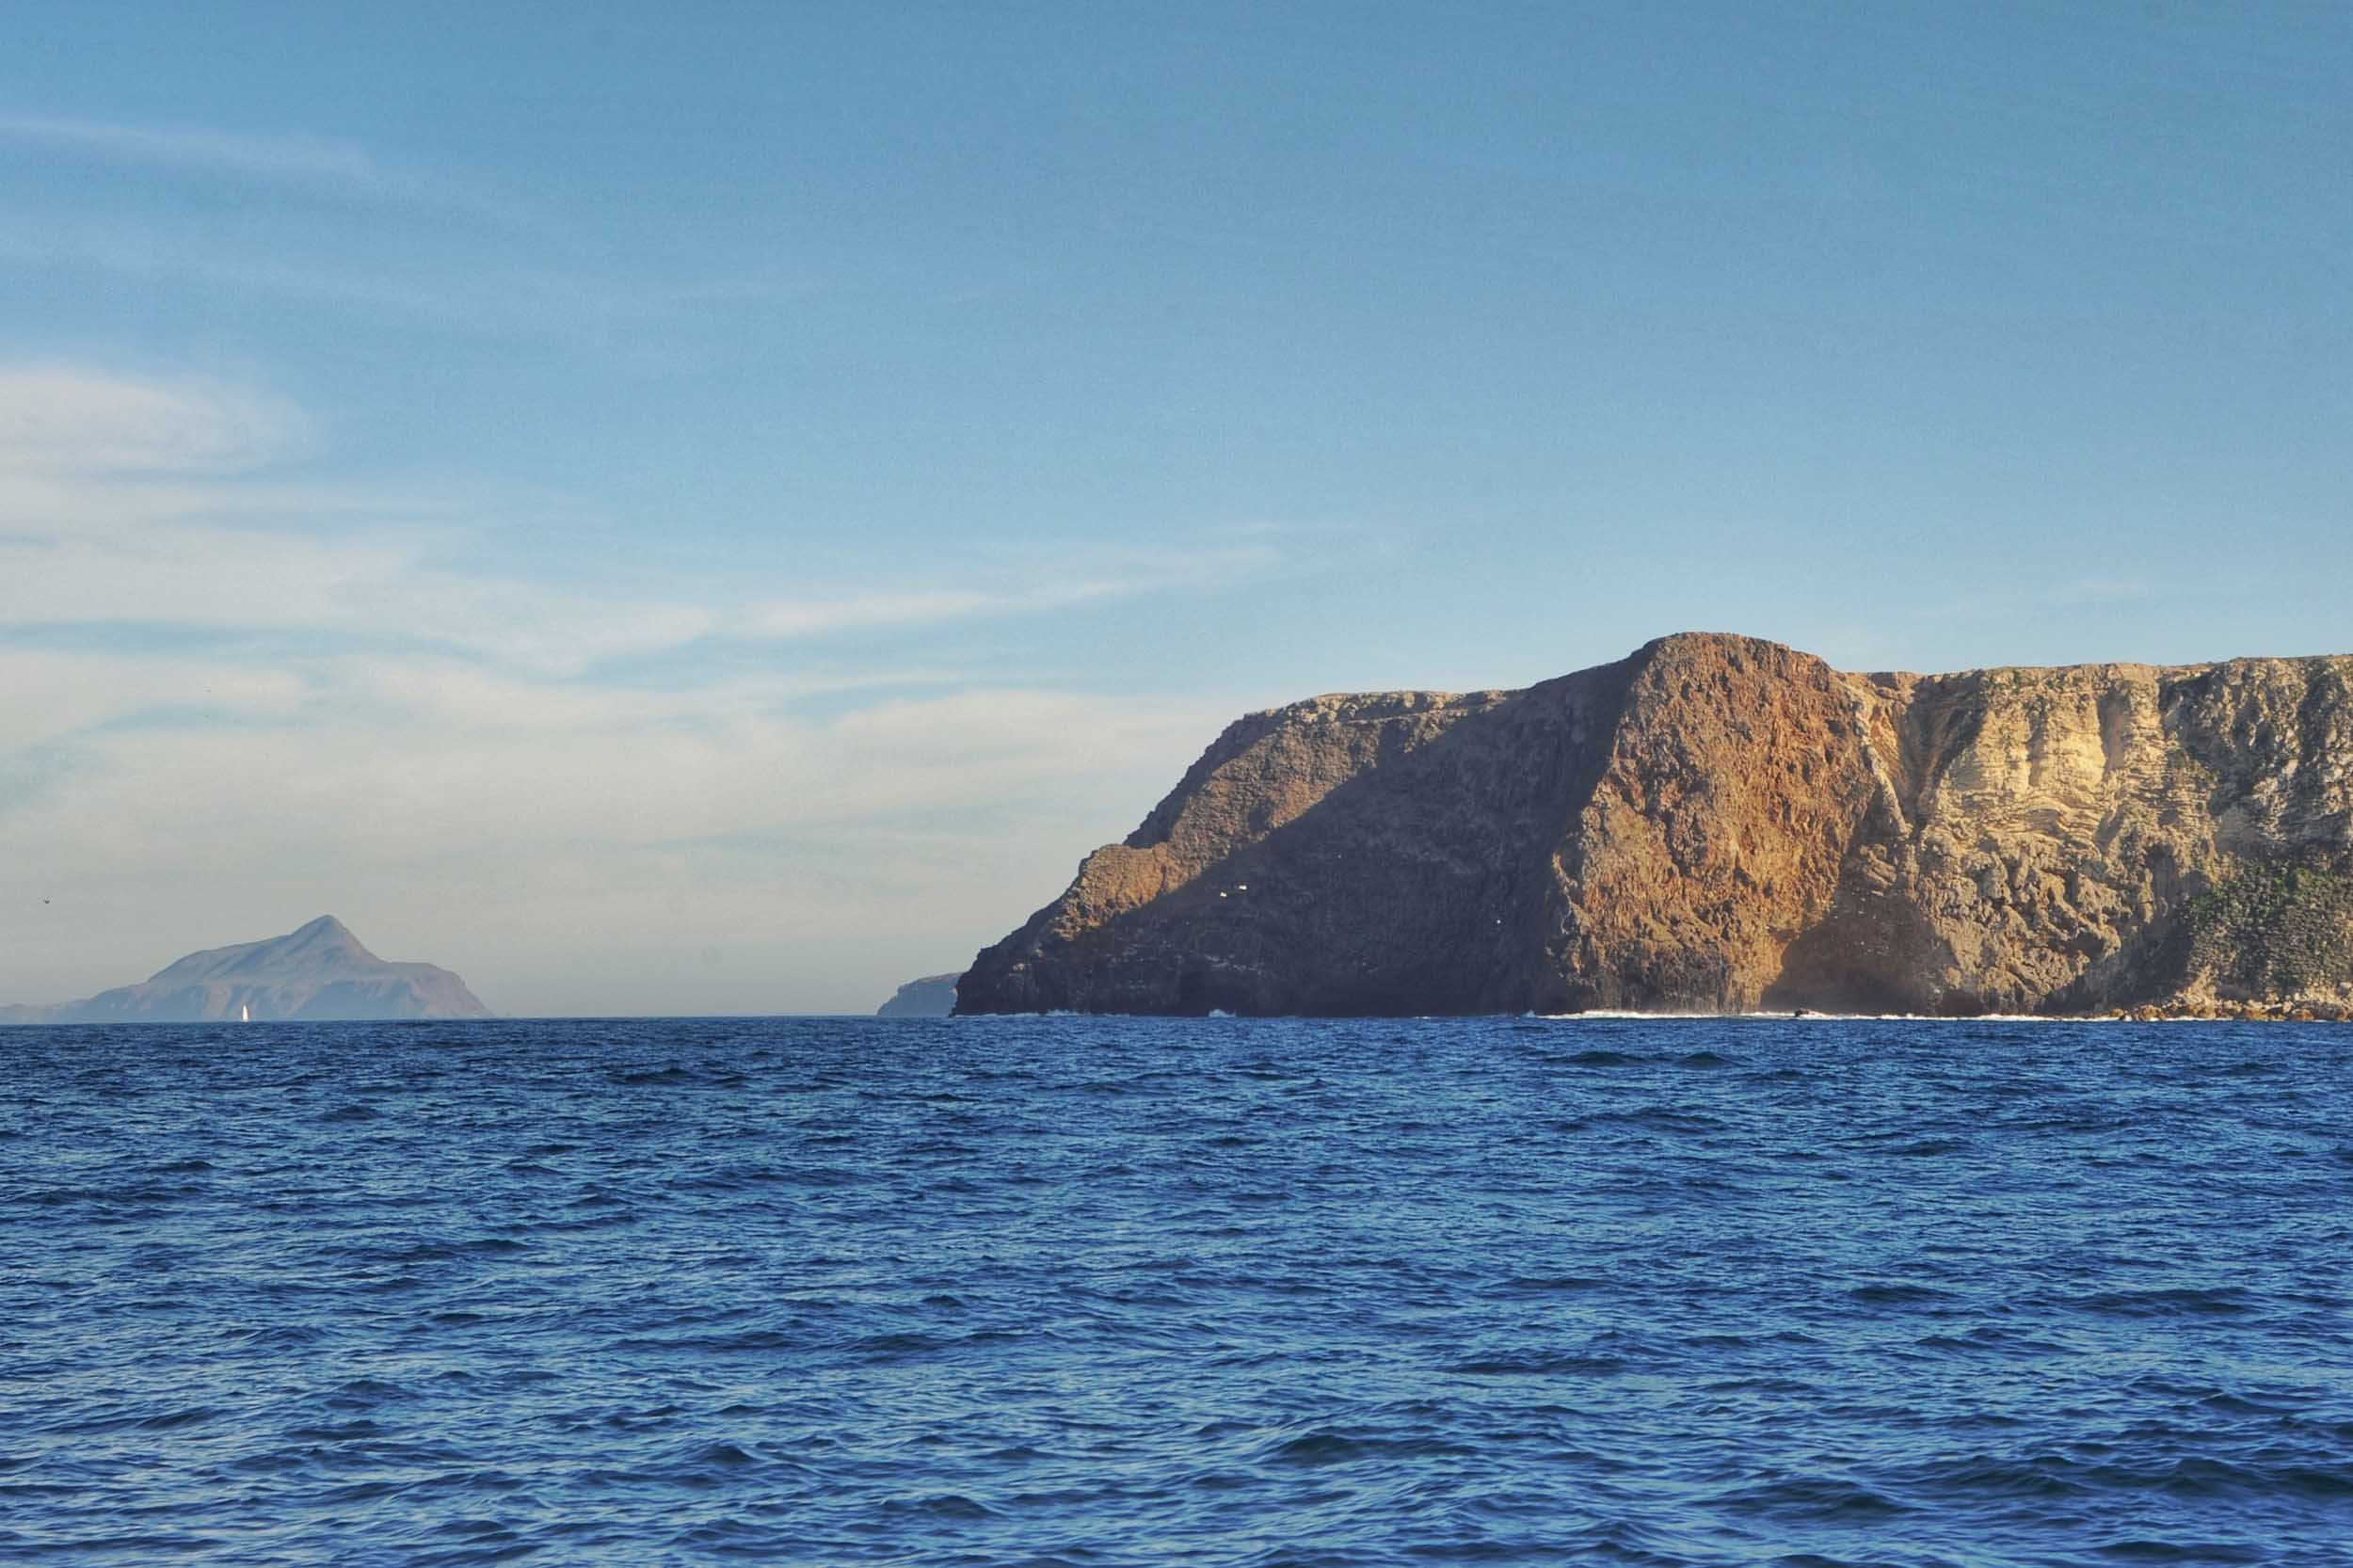 Island Hopping On The Channel Islands Visit Santa Barbara